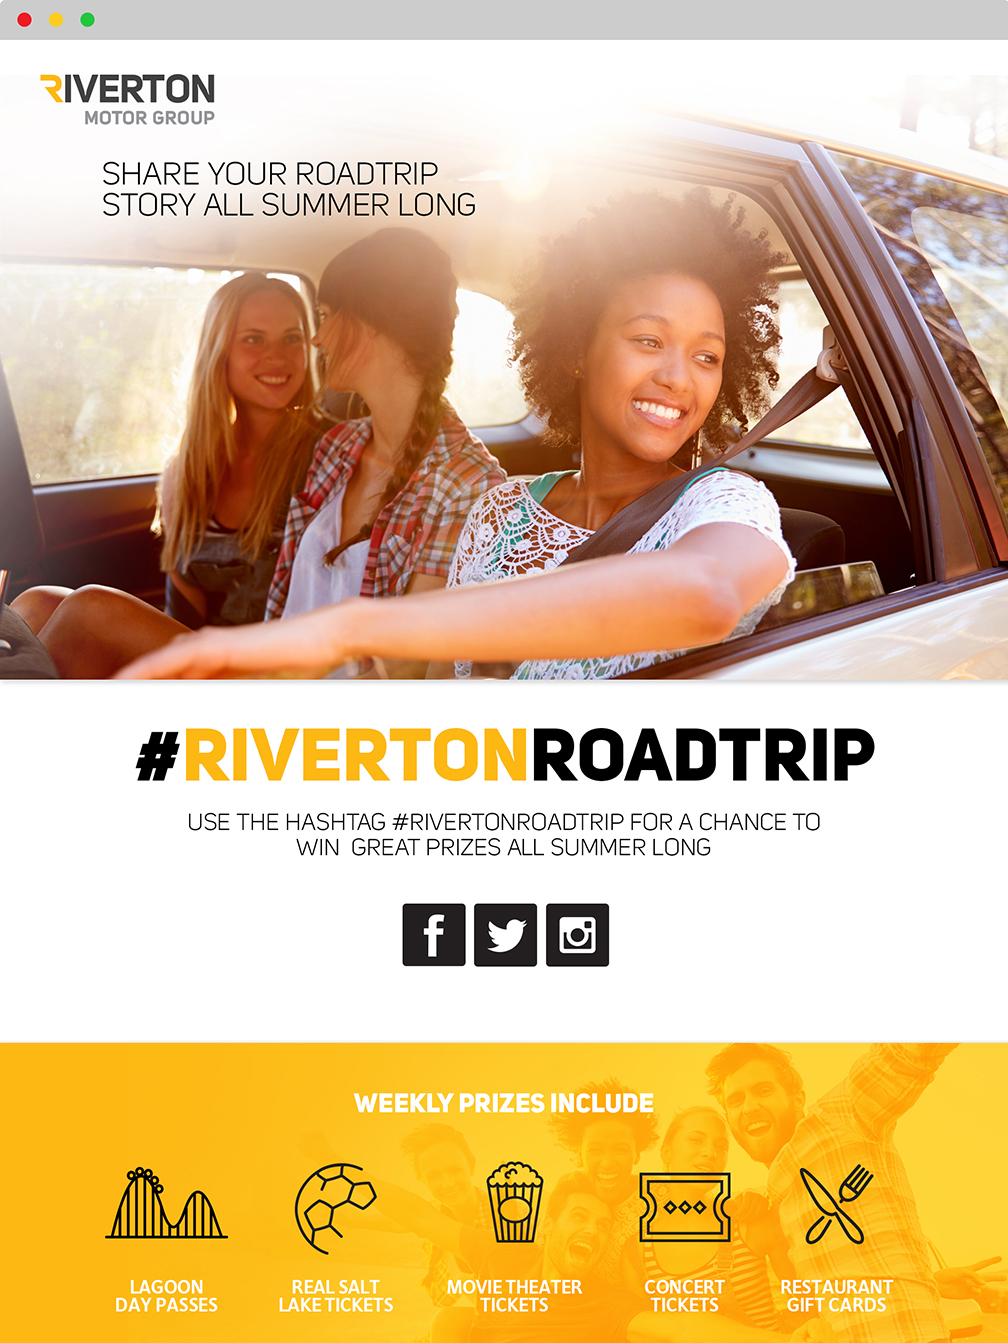 View rivertonroadtrip.com for full site